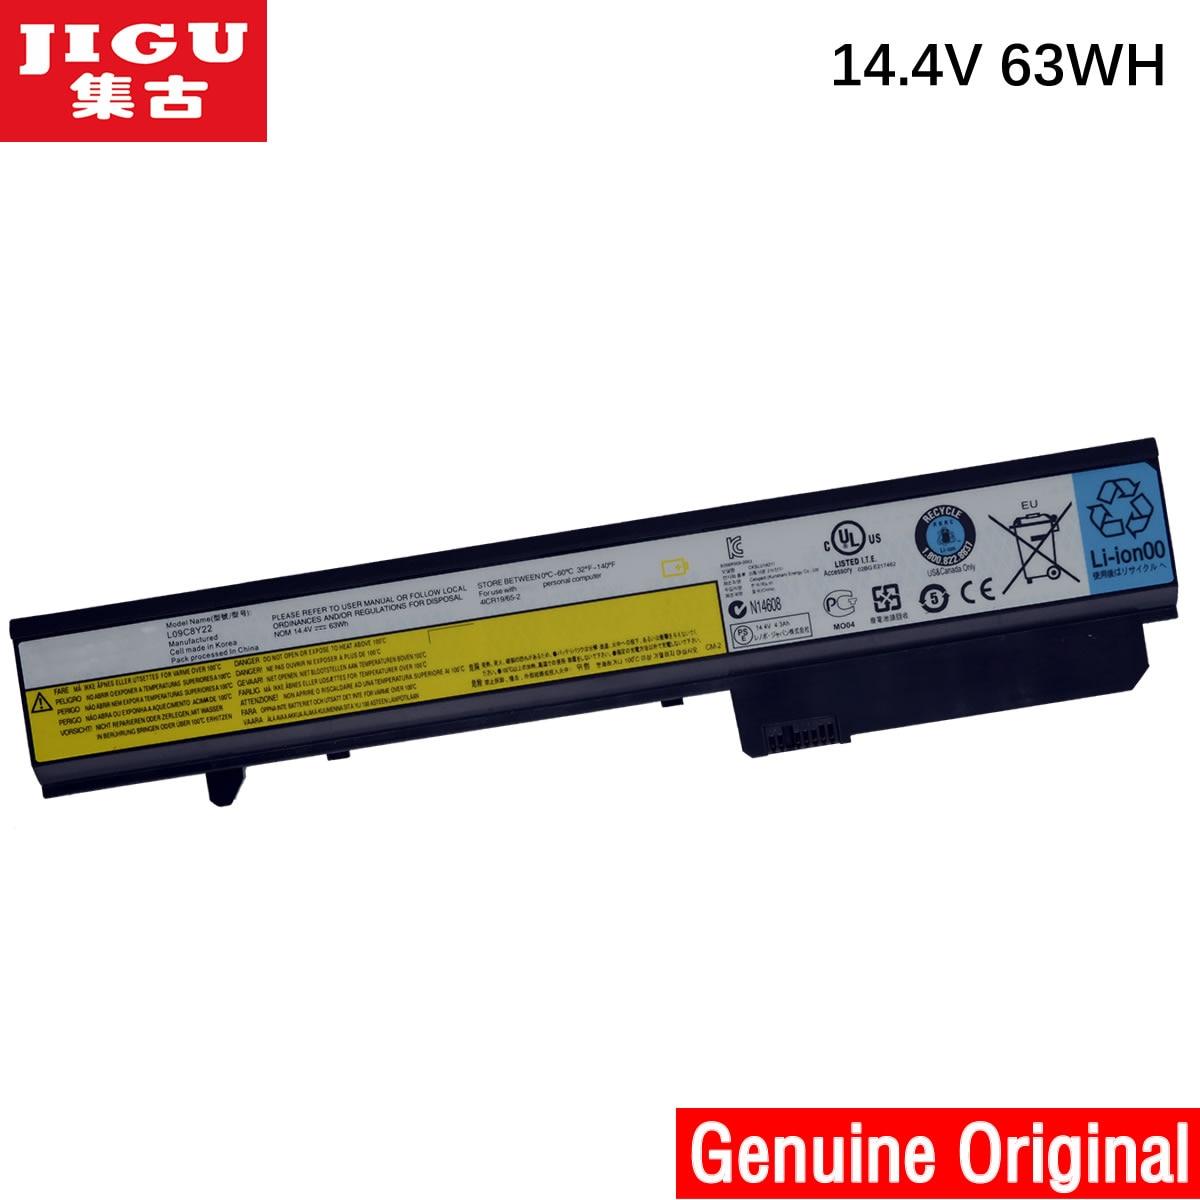 JIGU L09N8T22 L09N8Y22 L09P8Y22 LO9P8Y22 Original laptop Battery For Lenovo IdeaPad U460 14.4V 64WH laptop batteries for lenovo ideapad u350 20028 l09n8p01 l09c4p1 14 8v 8 cell